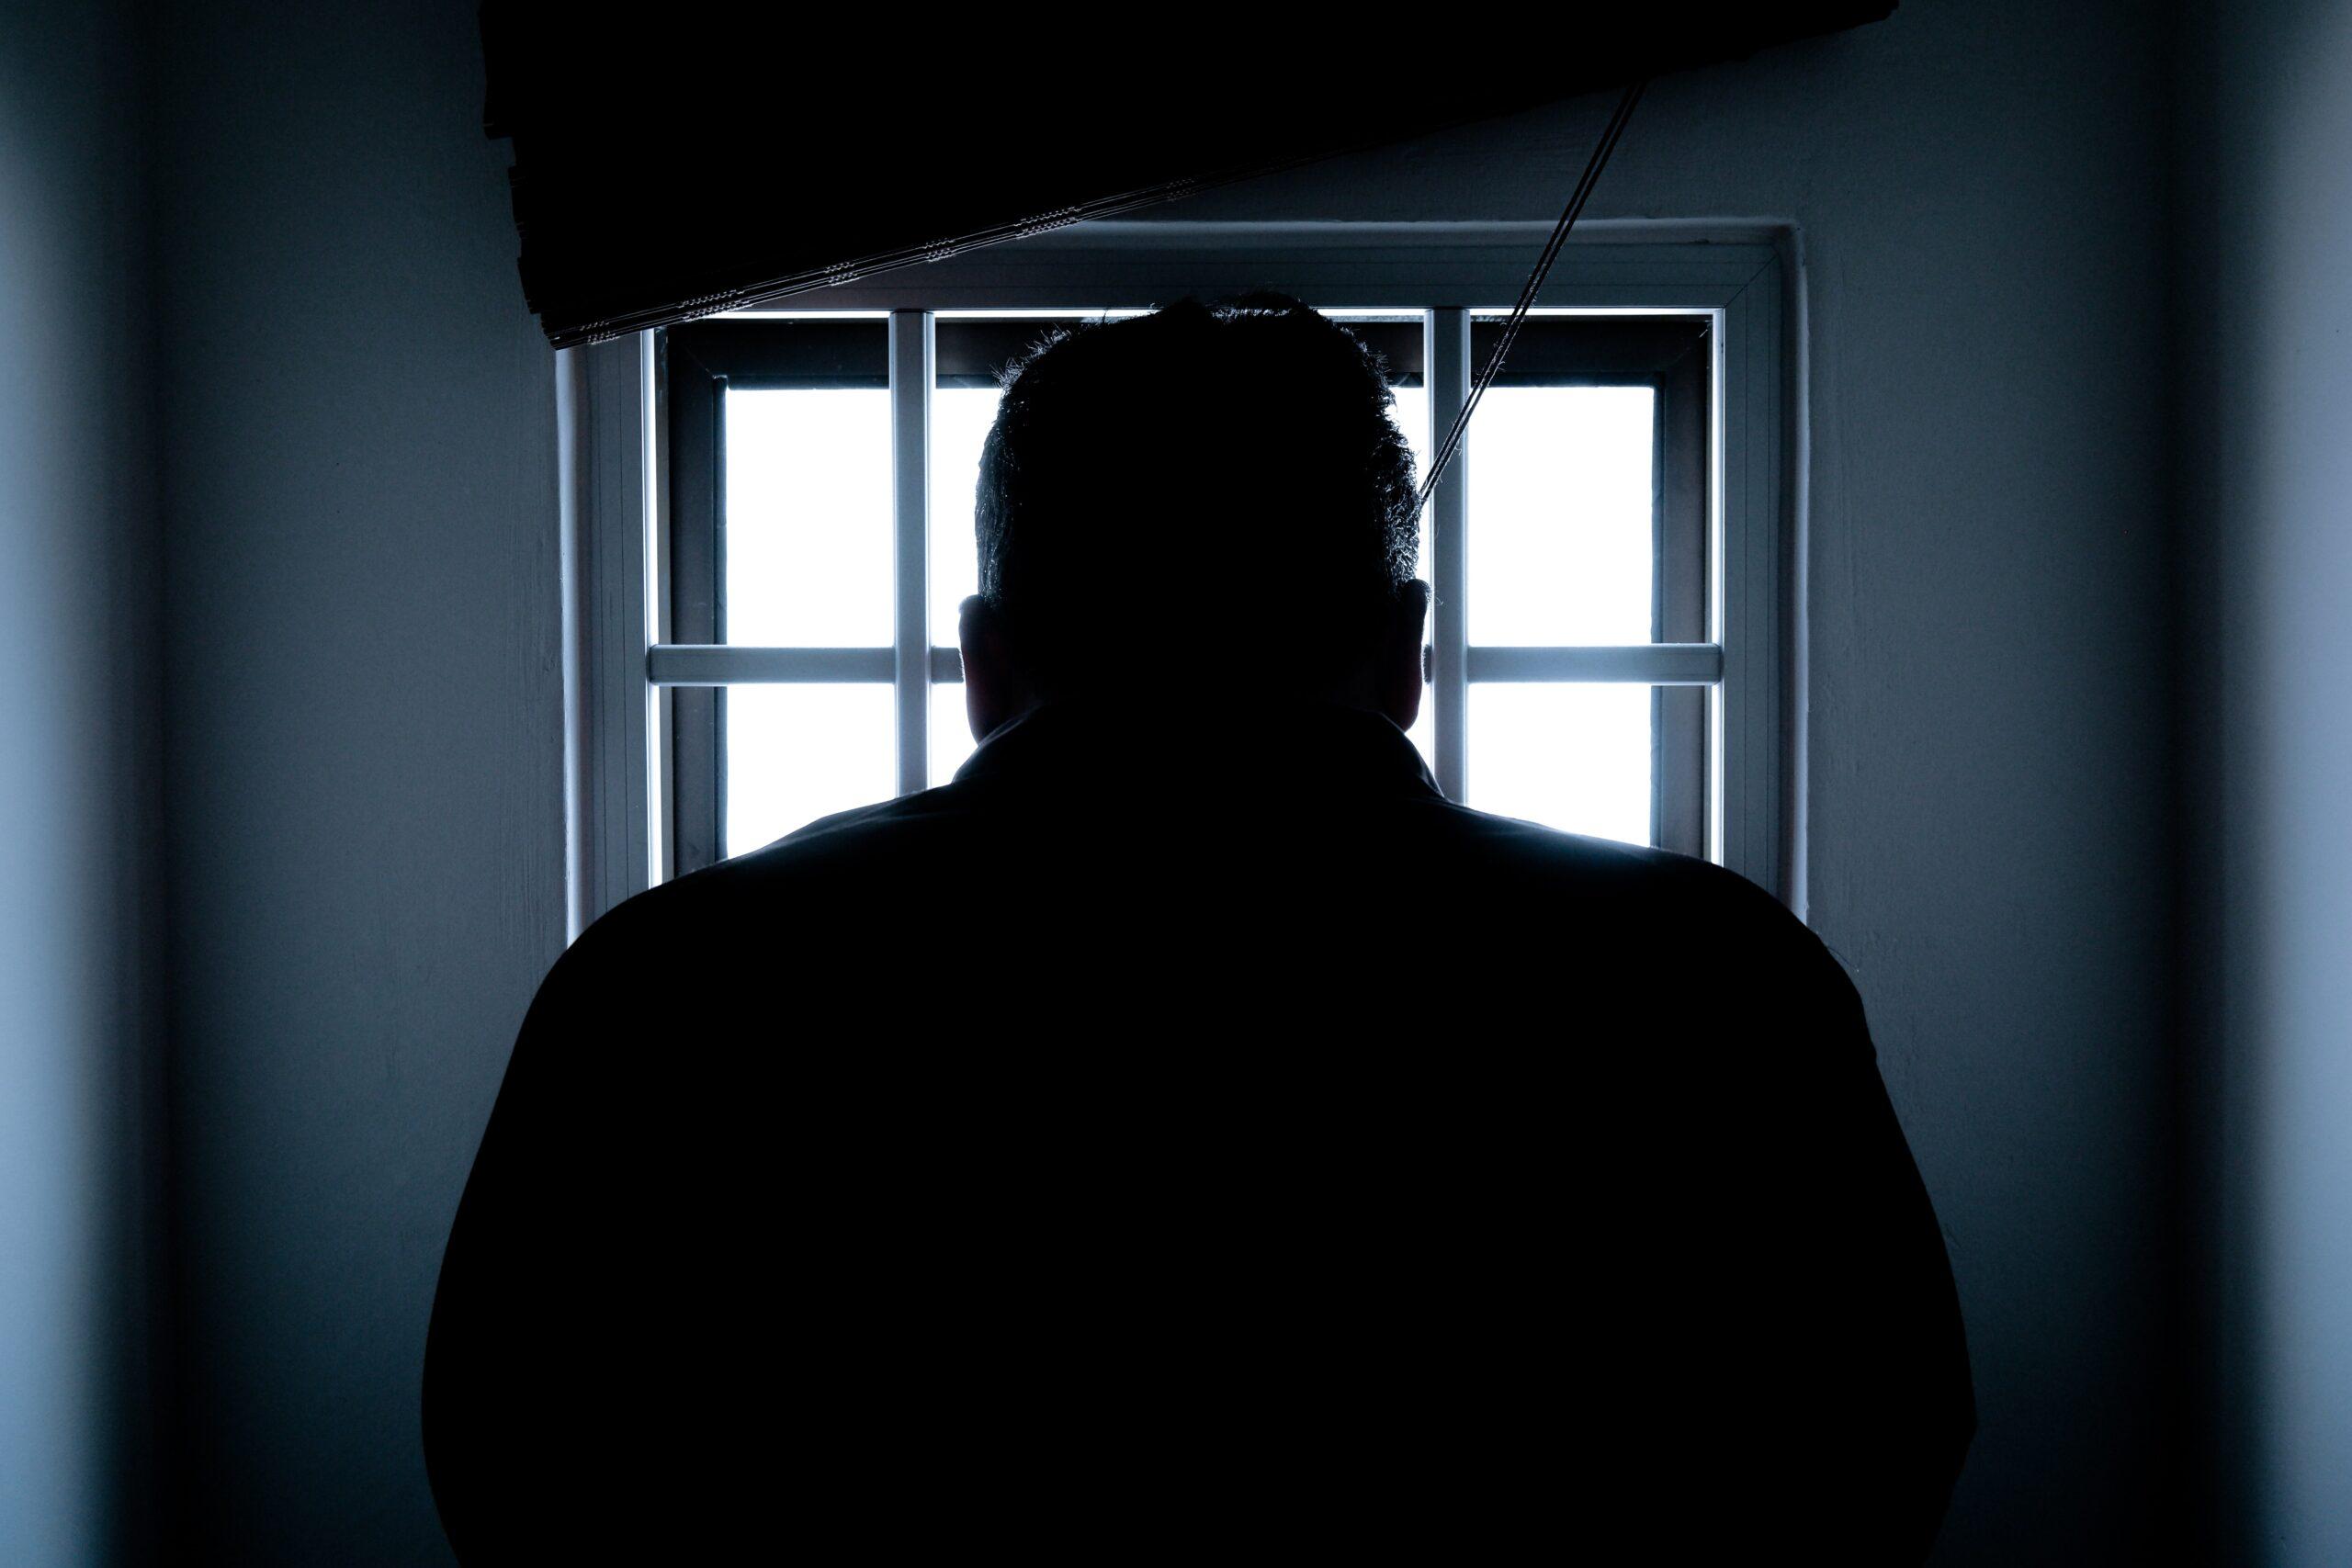 silhouette-of-a-man-in-window-143580